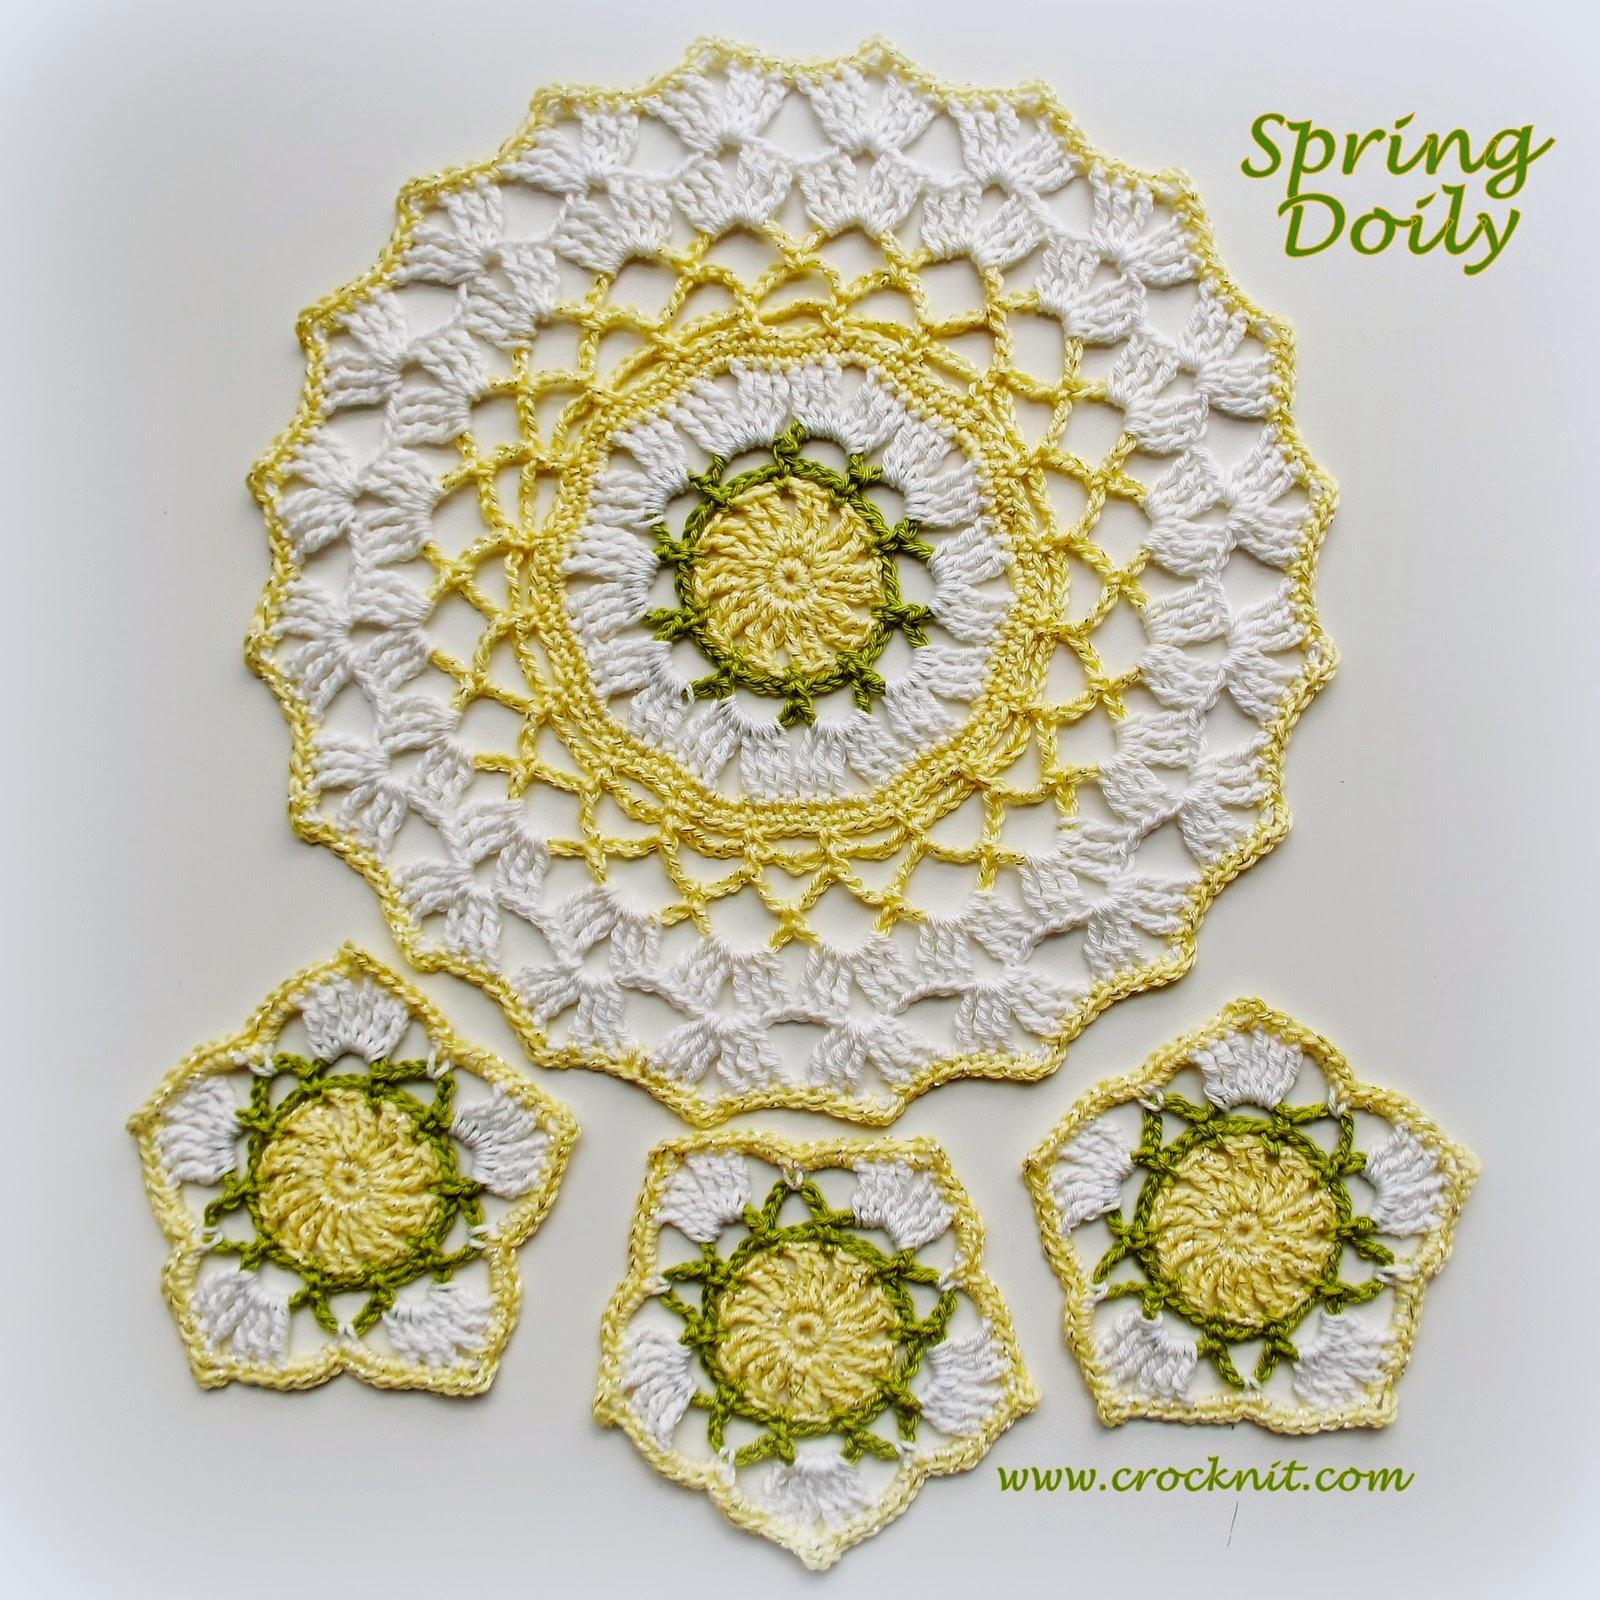 spring doily crochet pattern